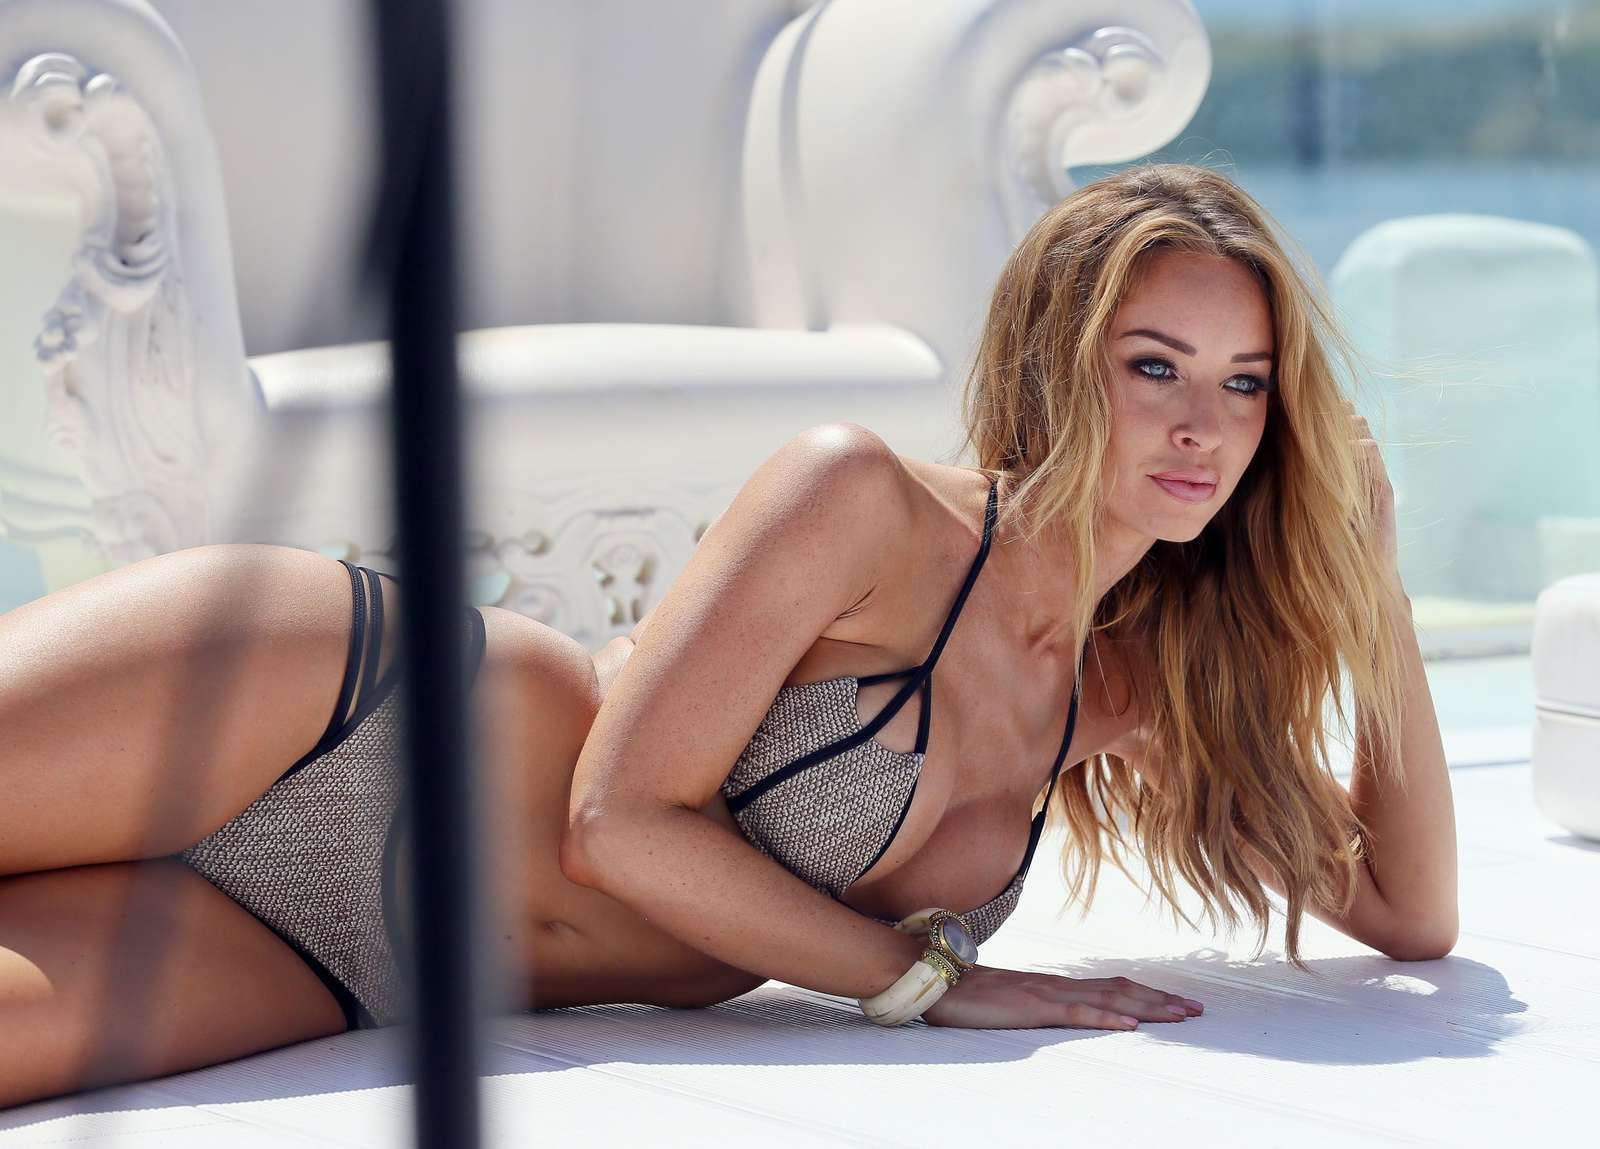 loren-pope-bikini-pictures-facials-nude